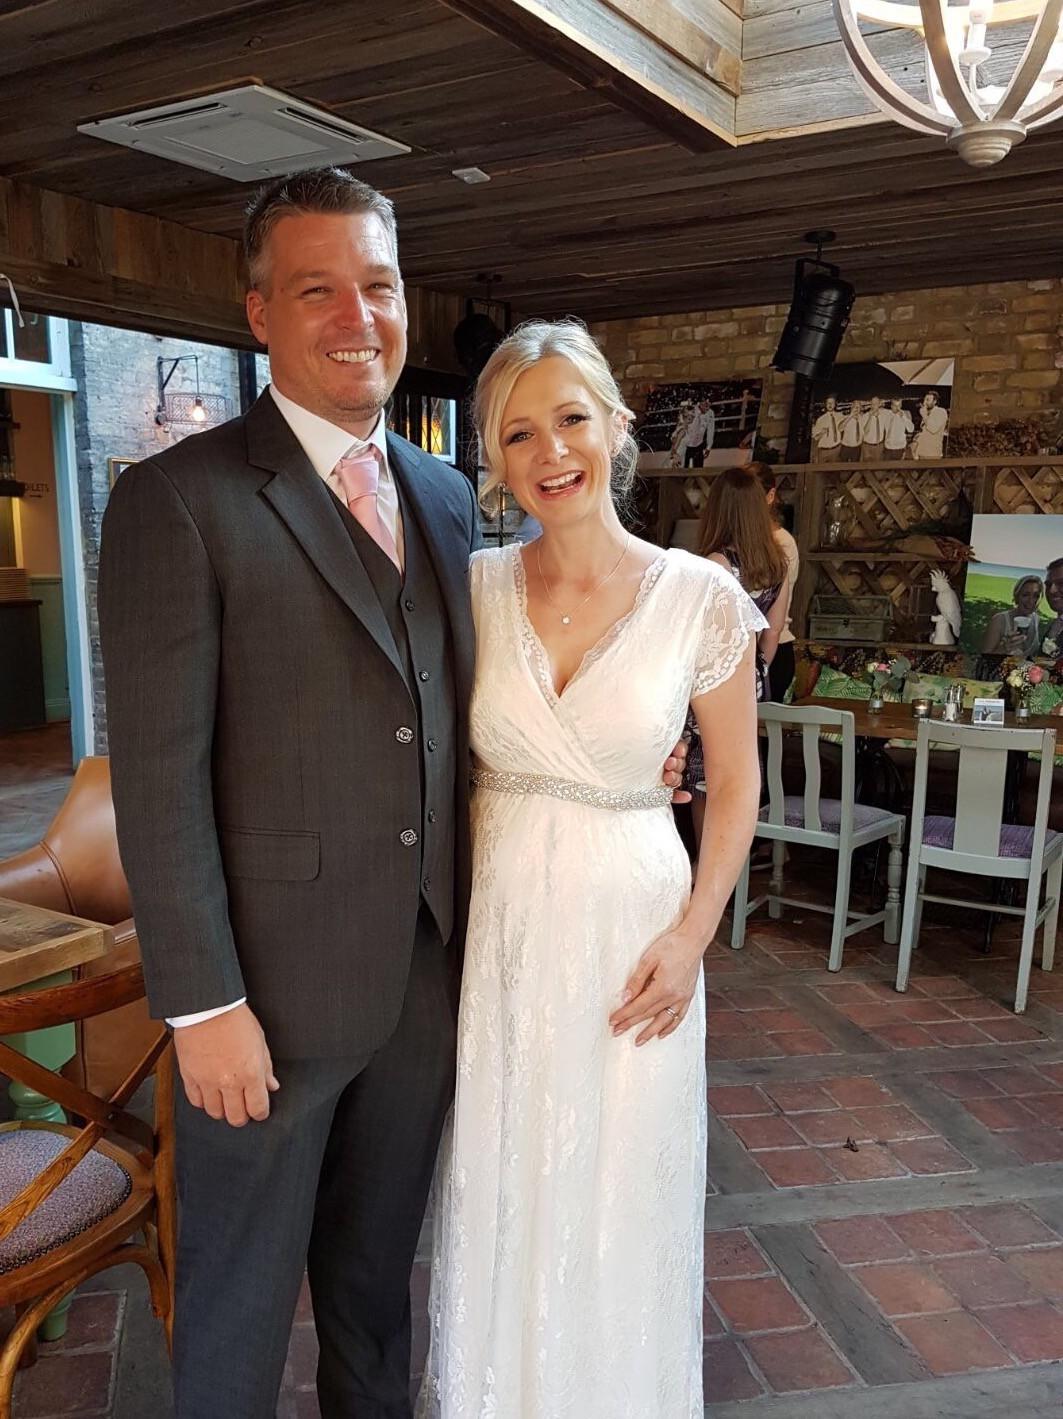 94ed043c4e9c5 Tiffany Rose Eden Gown Long Second Hand Wedding Dress on Sale 25% Off -  Stillwhite United Kingdom